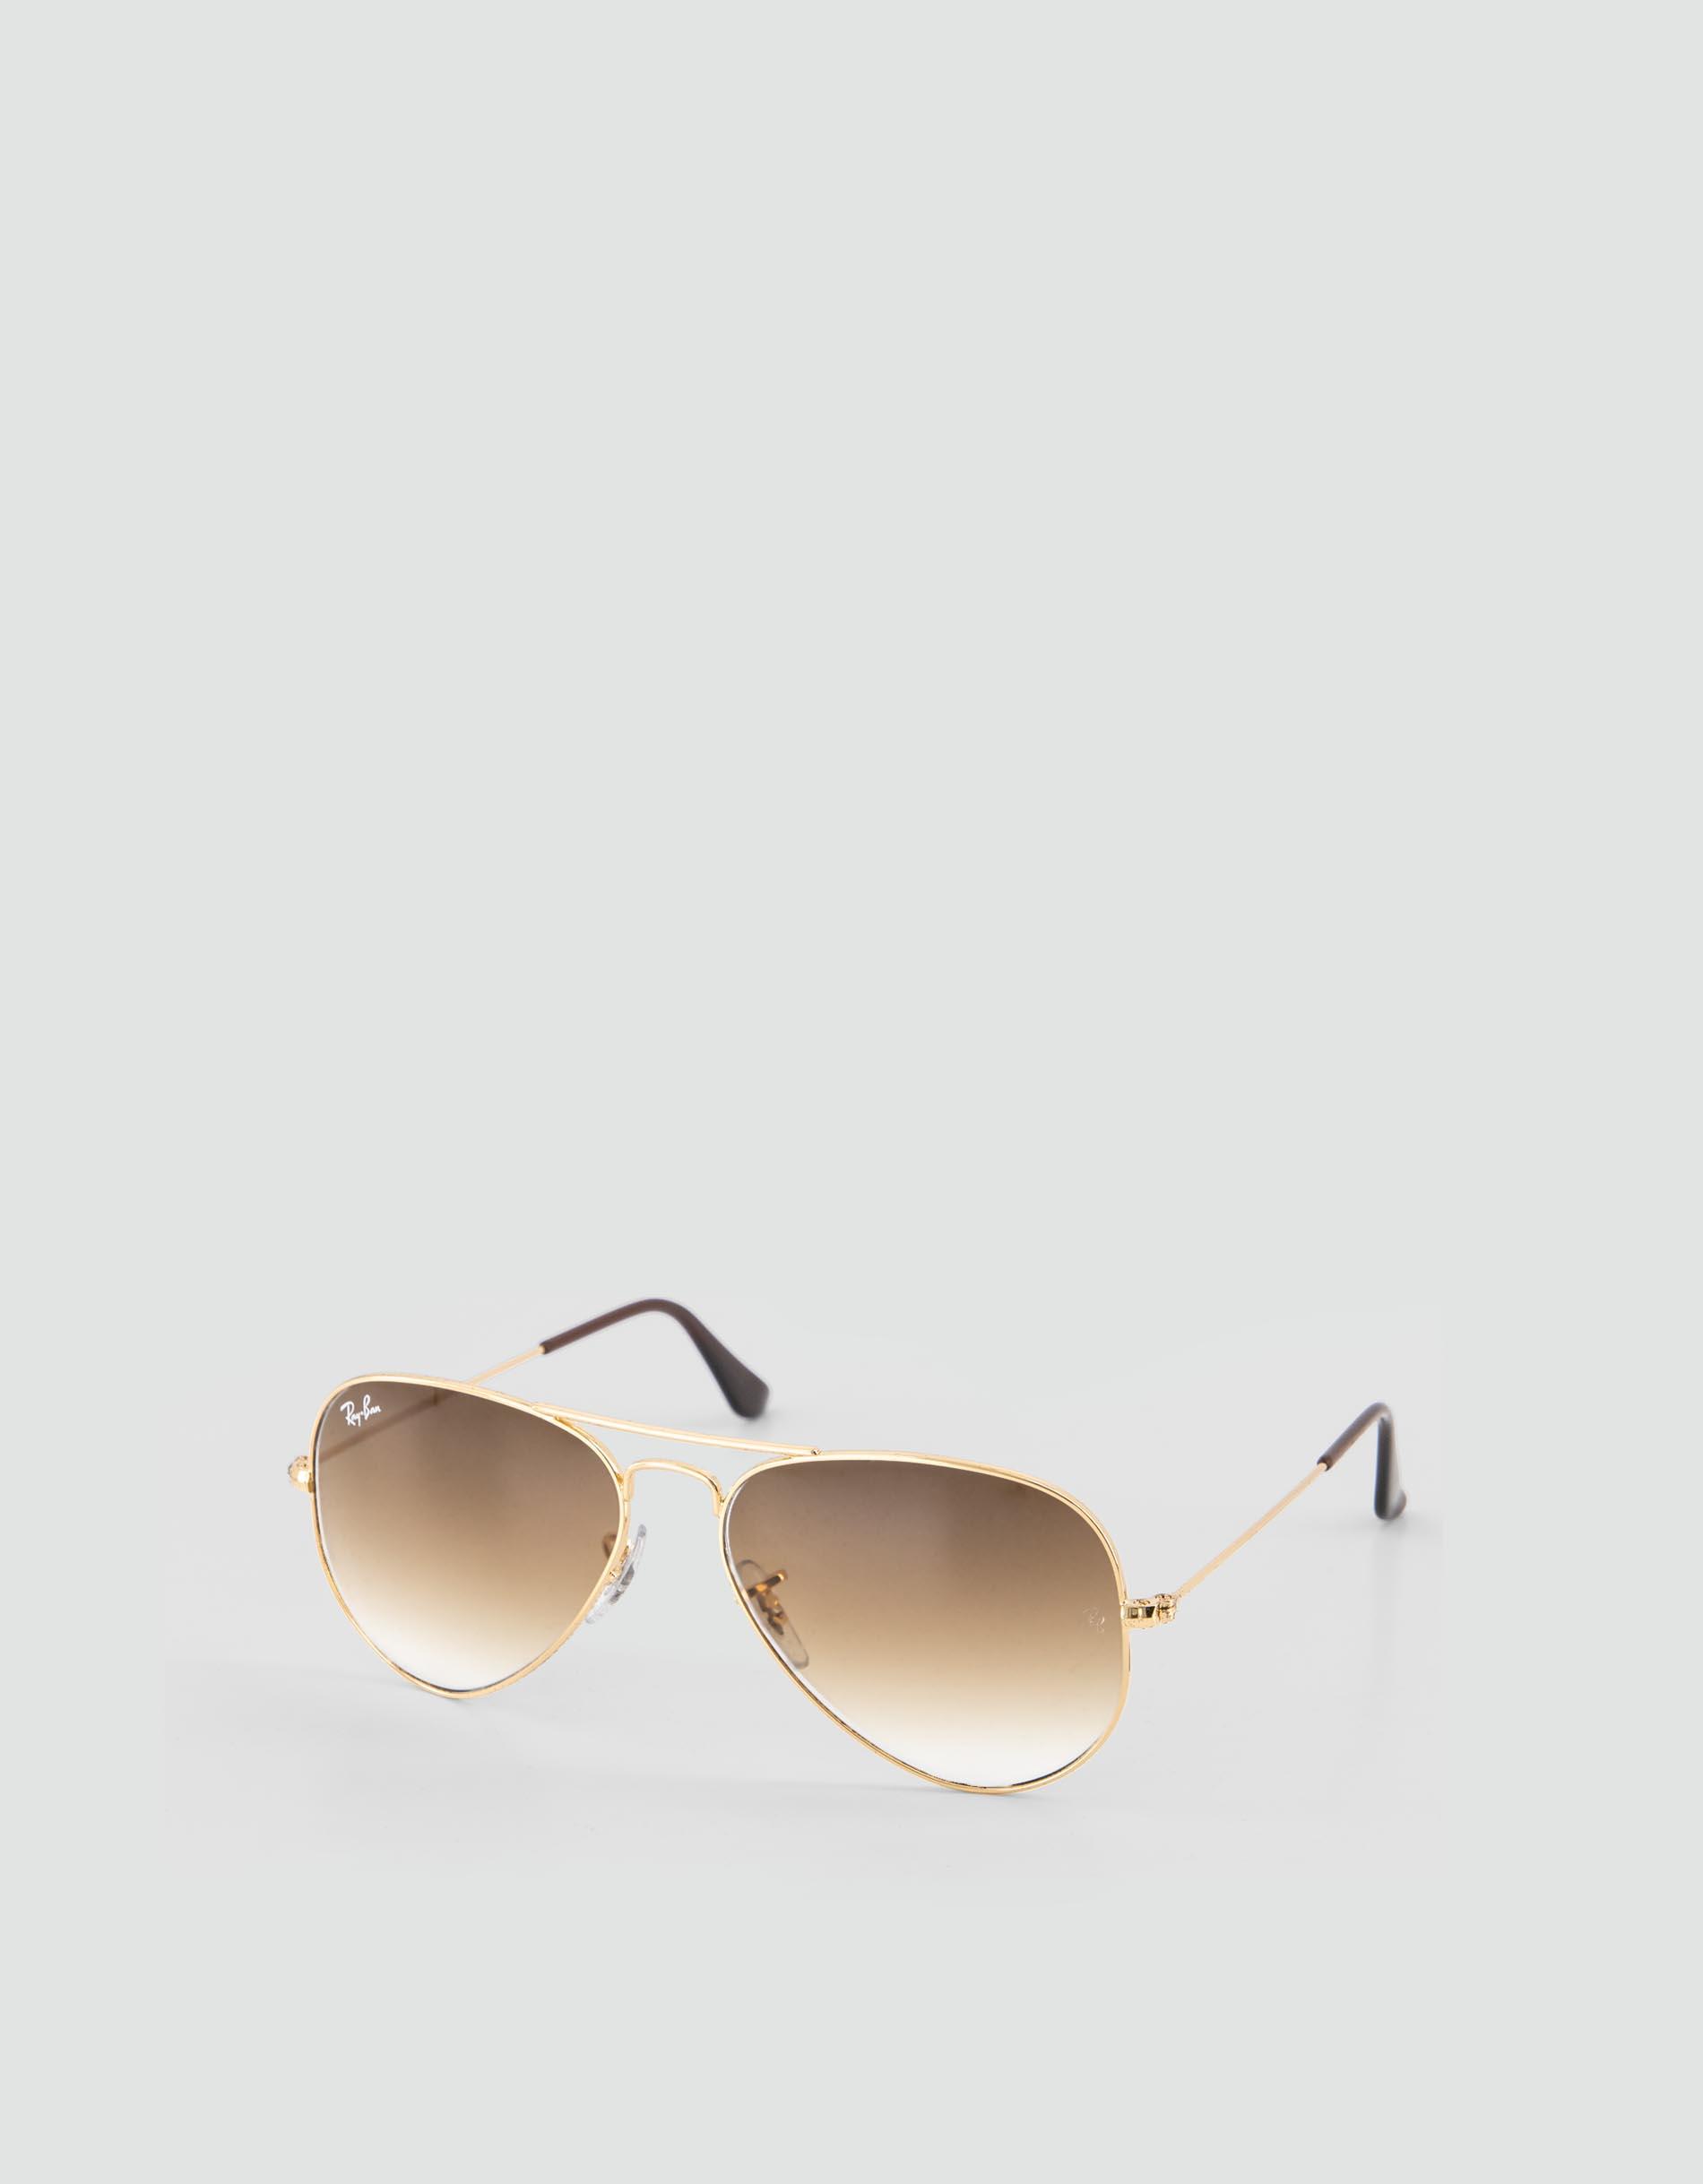 ray ban brille sonnen